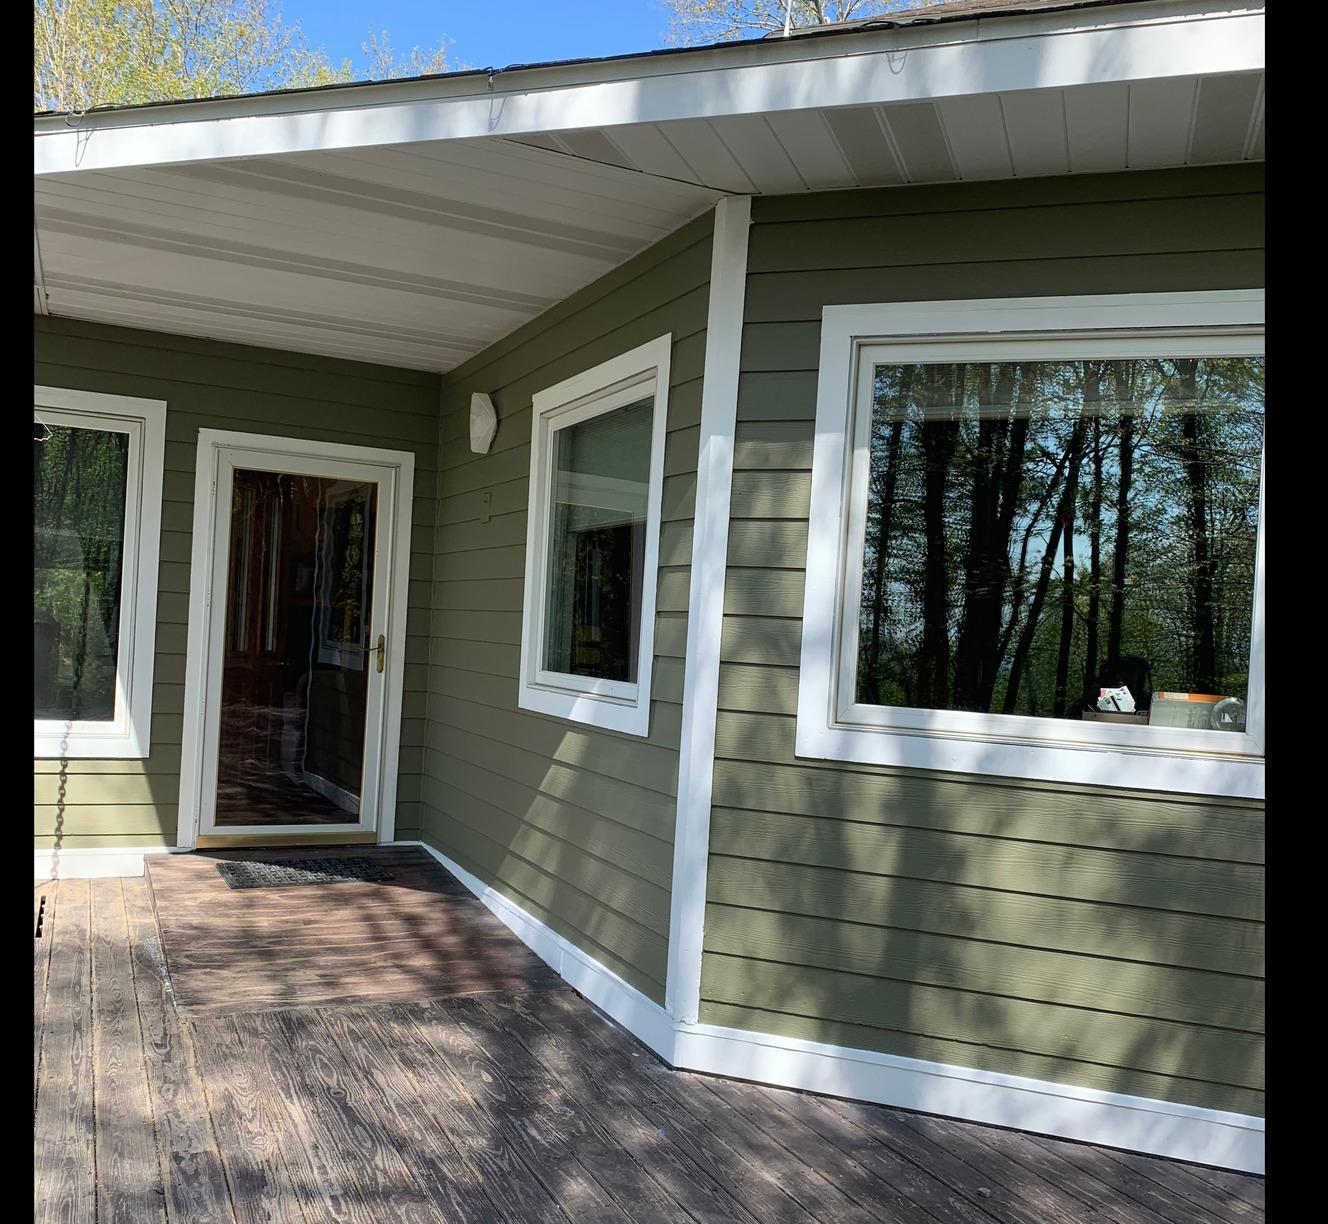 Deep Creek Lake House Painted with Rhino Shield - After Photo